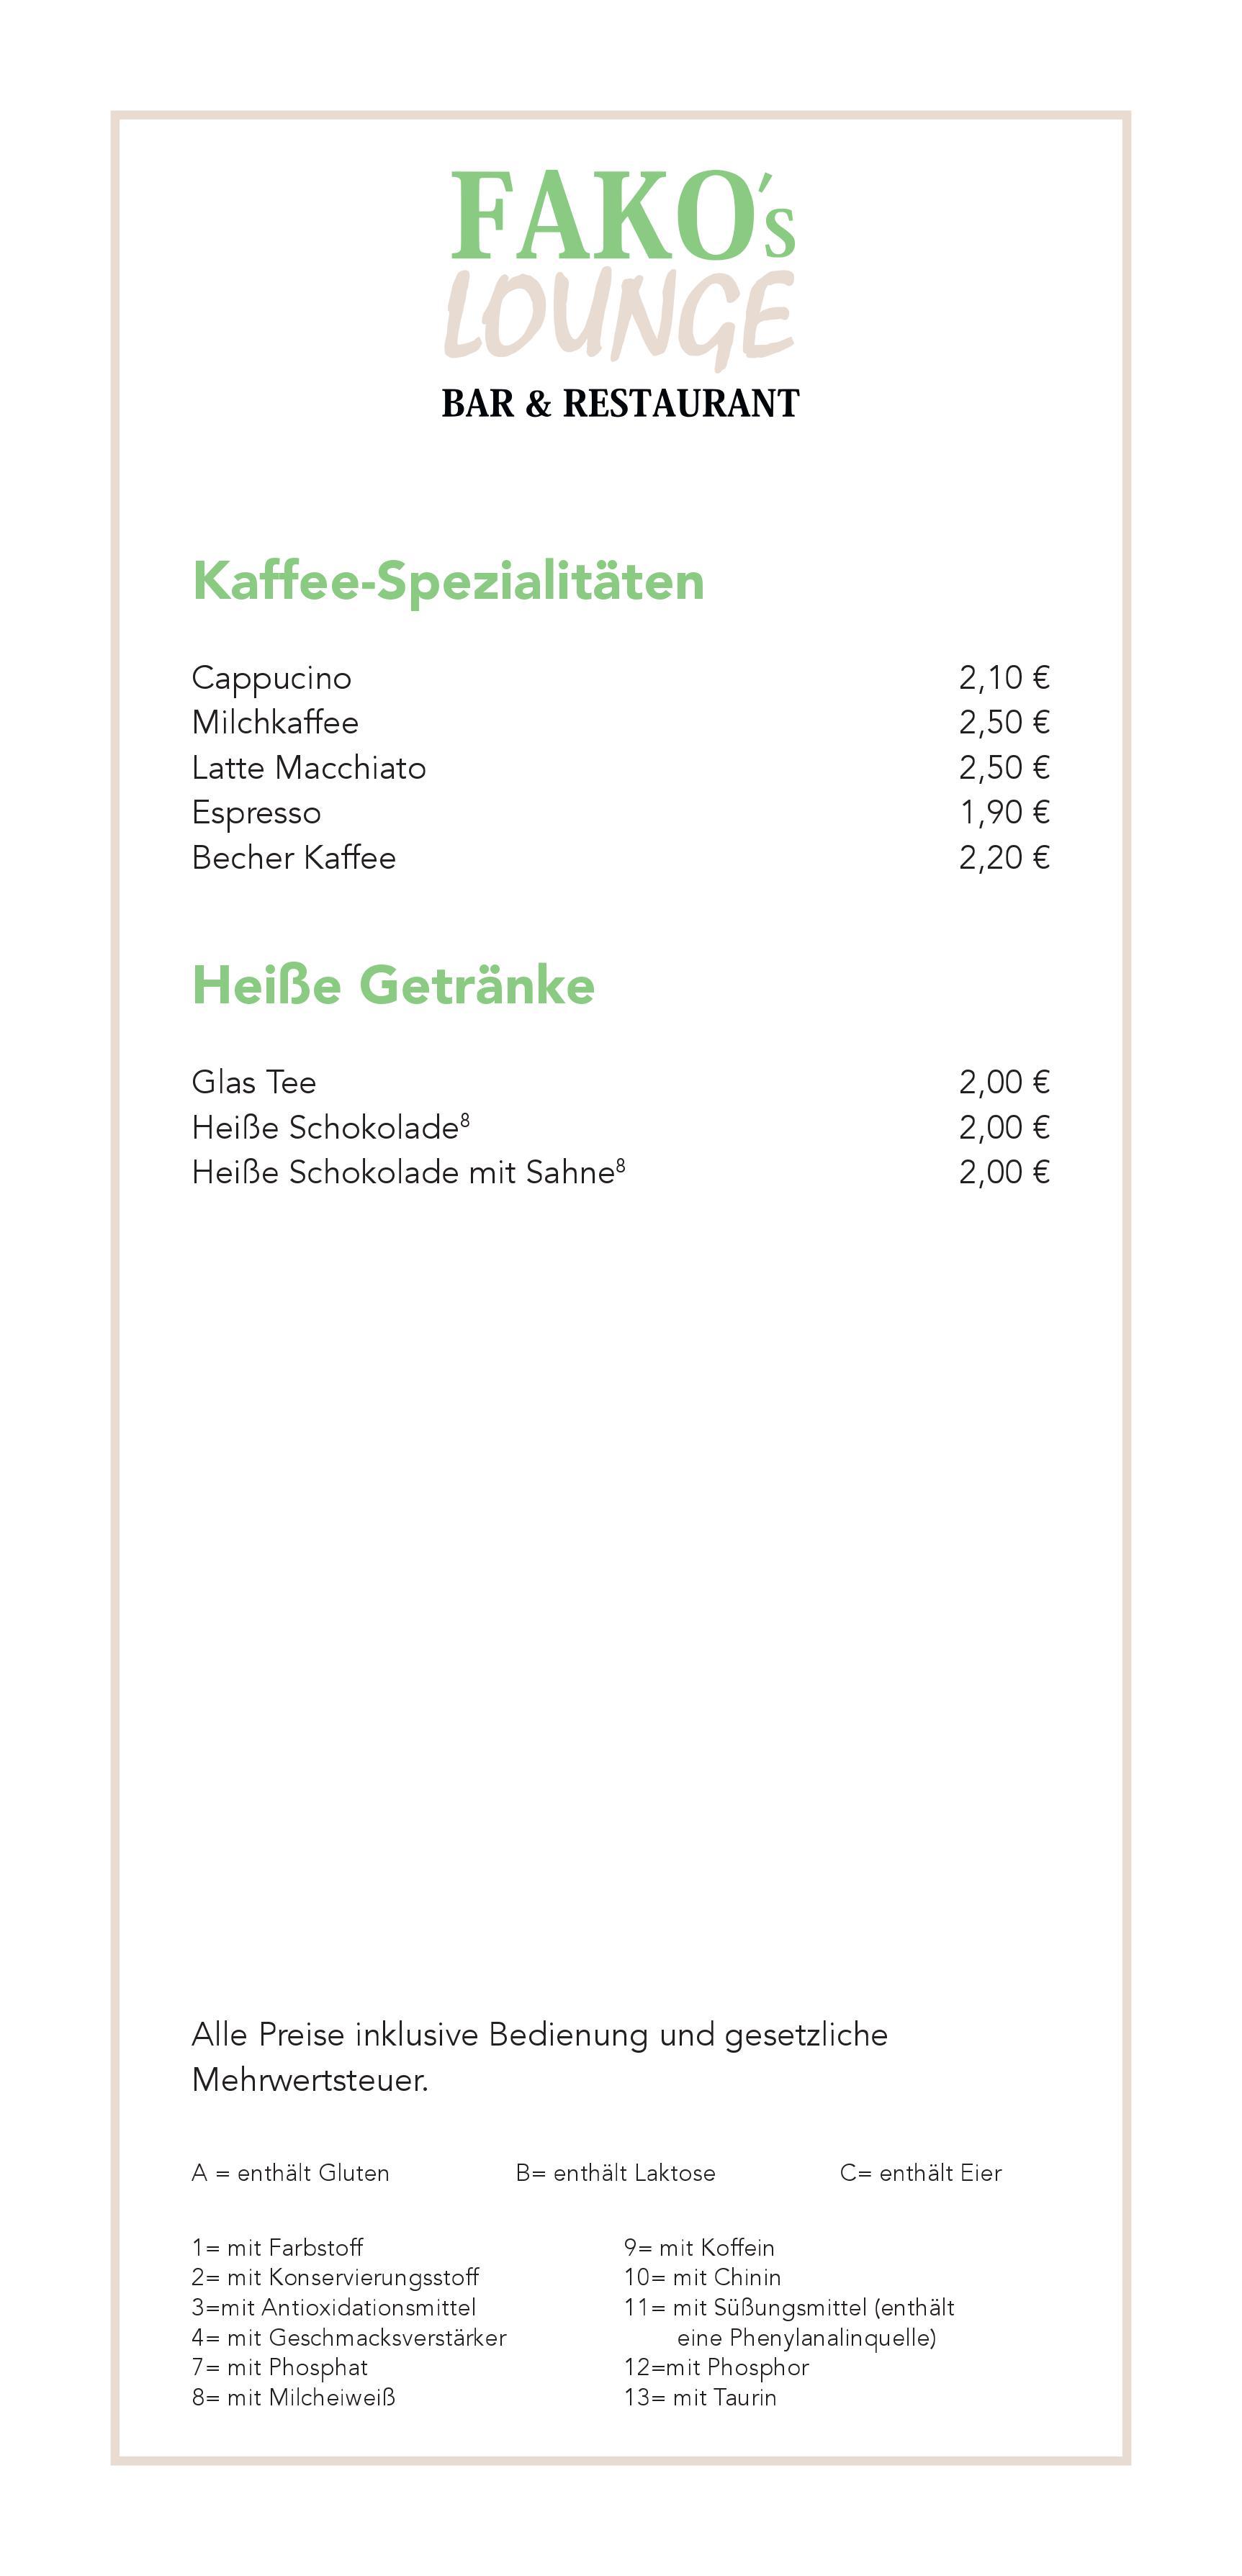 Alkoholfreie Getränke & Heiße Getränke   Fakos Lounge